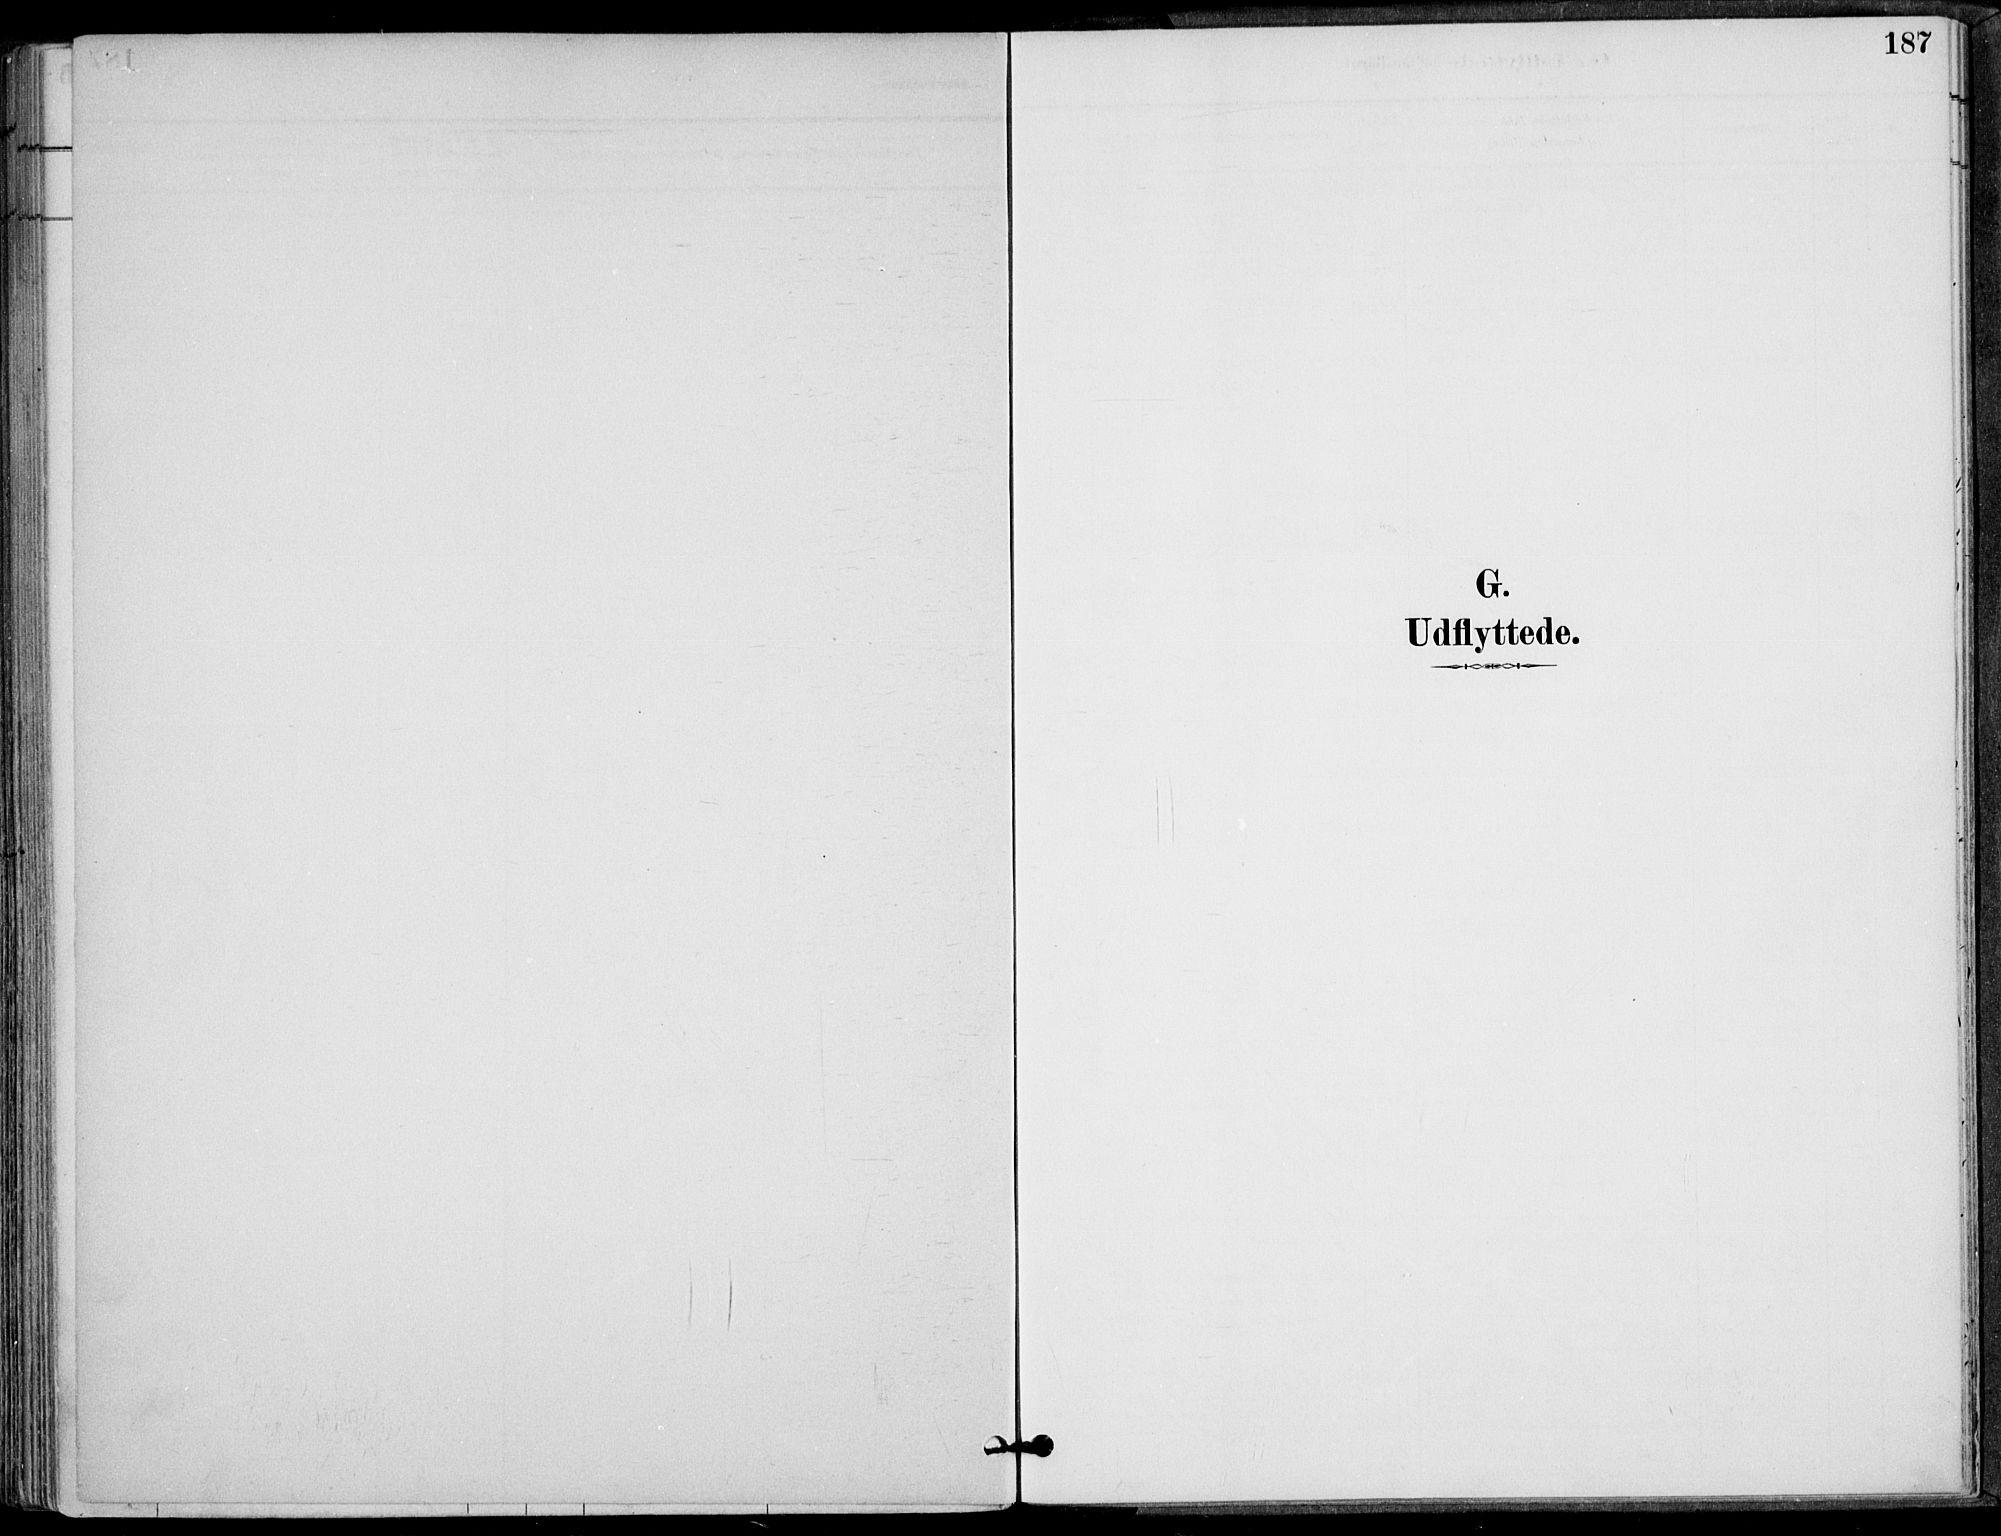 SAT, Ministerialprotokoller, klokkerbøker og fødselsregistre - Nordland, 825/L0362: Ministerialbok nr. 825A16, 1886-1908, s. 187